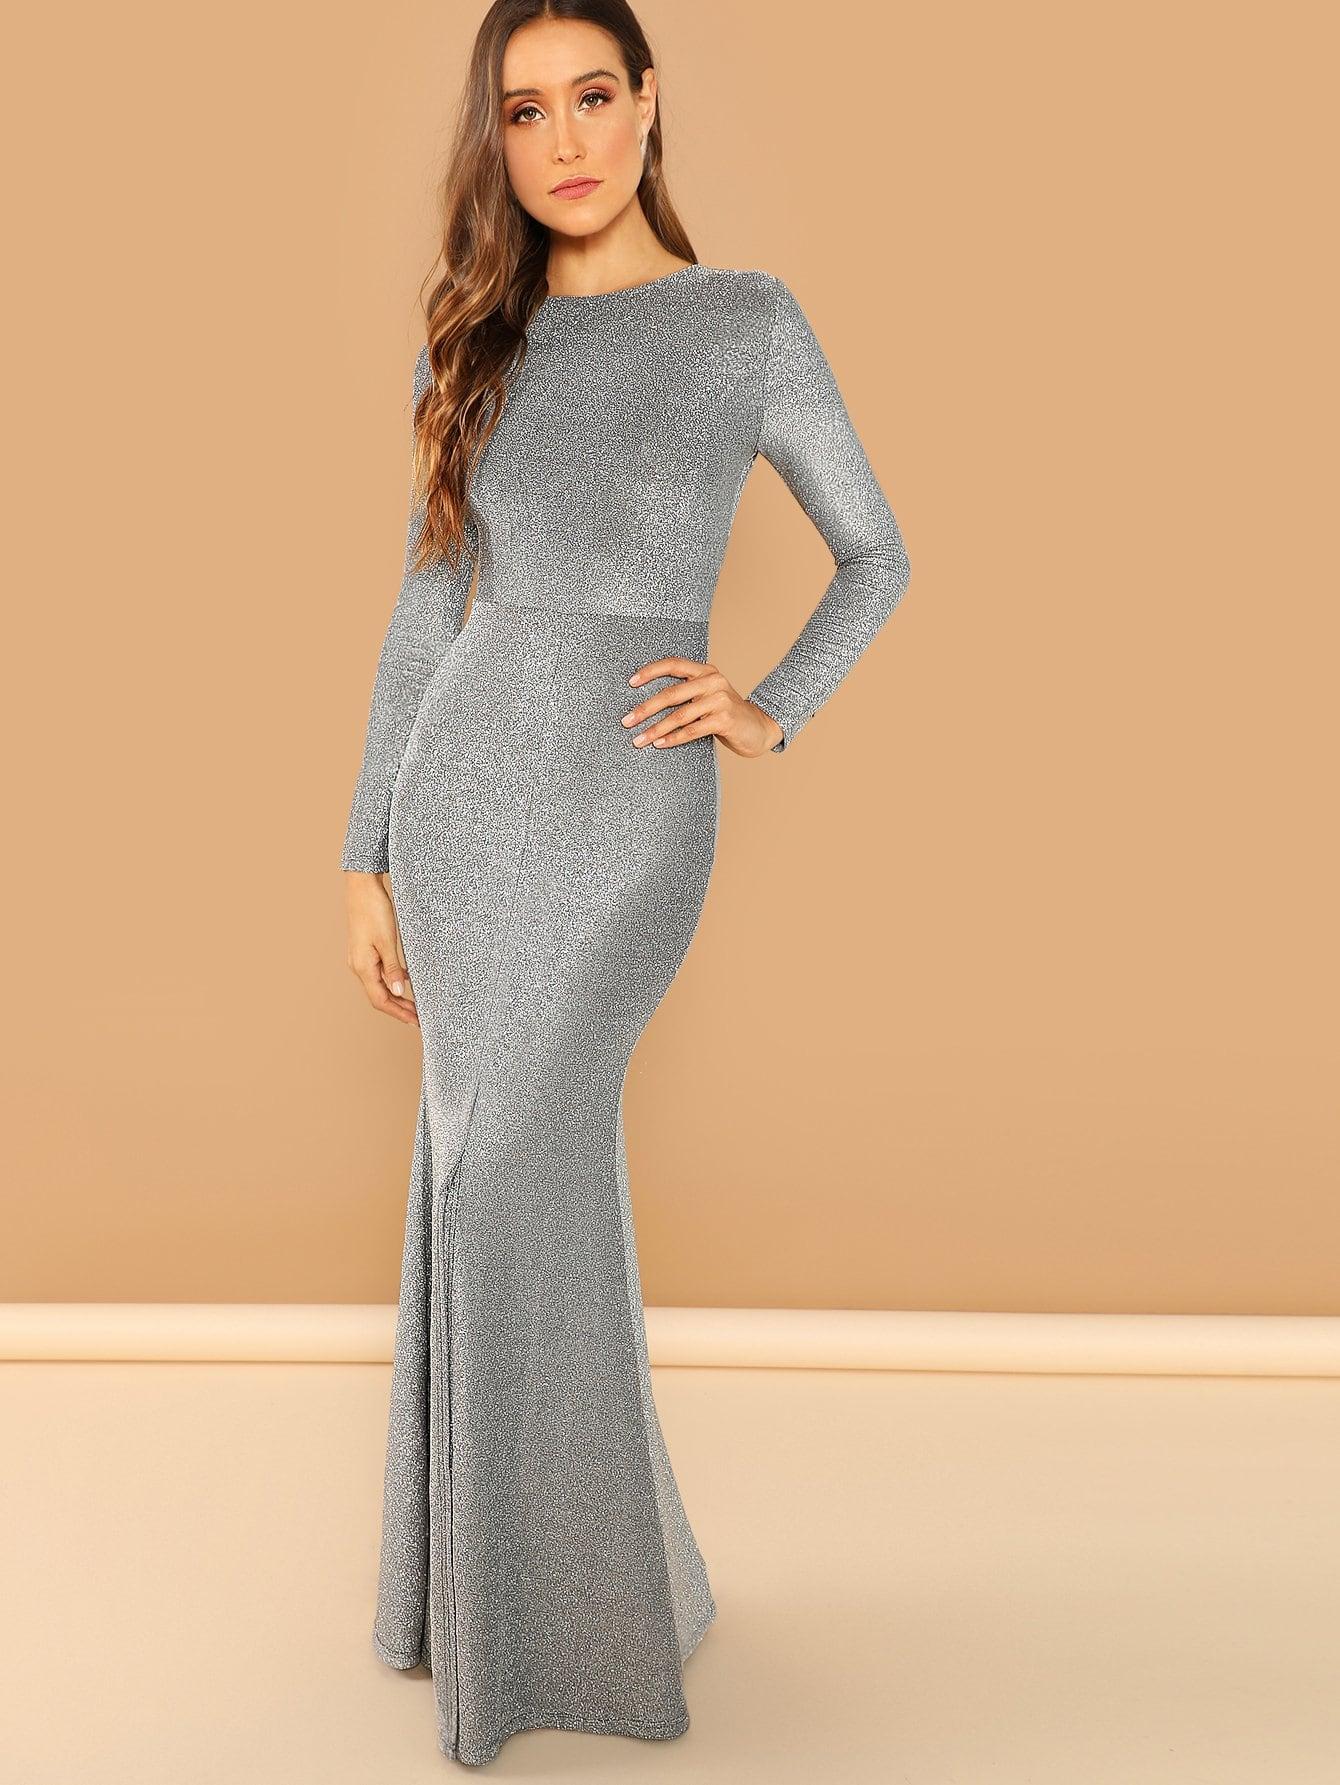 Open Back Slit Glitter Mermaid Prom Dress  f9e767b2171a